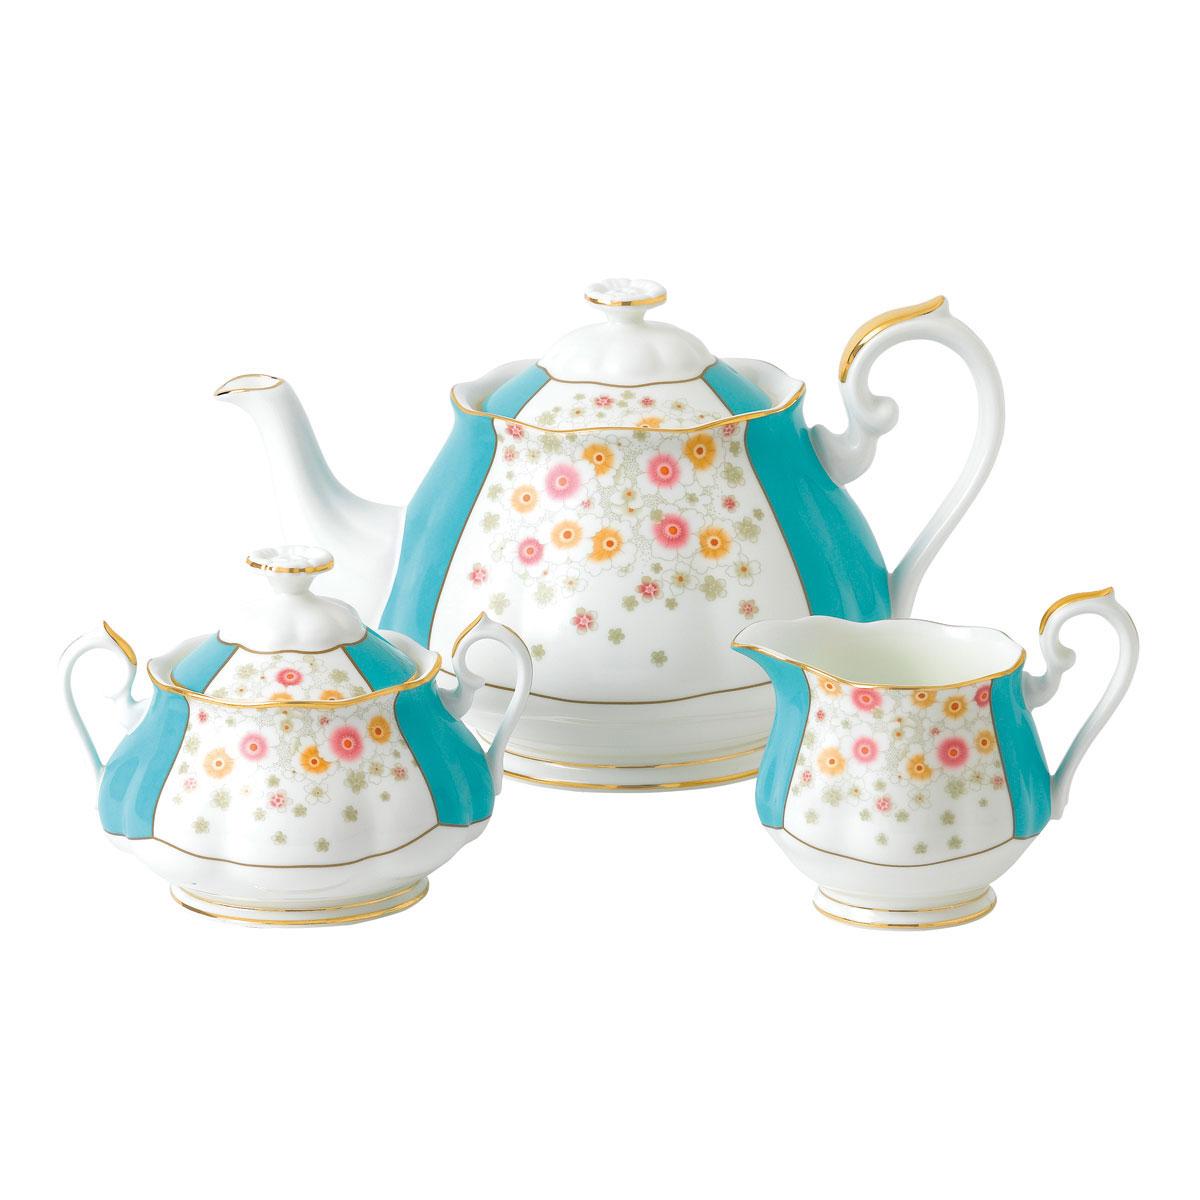 Royal Albert 100 Years 1930 Teapot, Sugar and Creamer Set Mint Deco